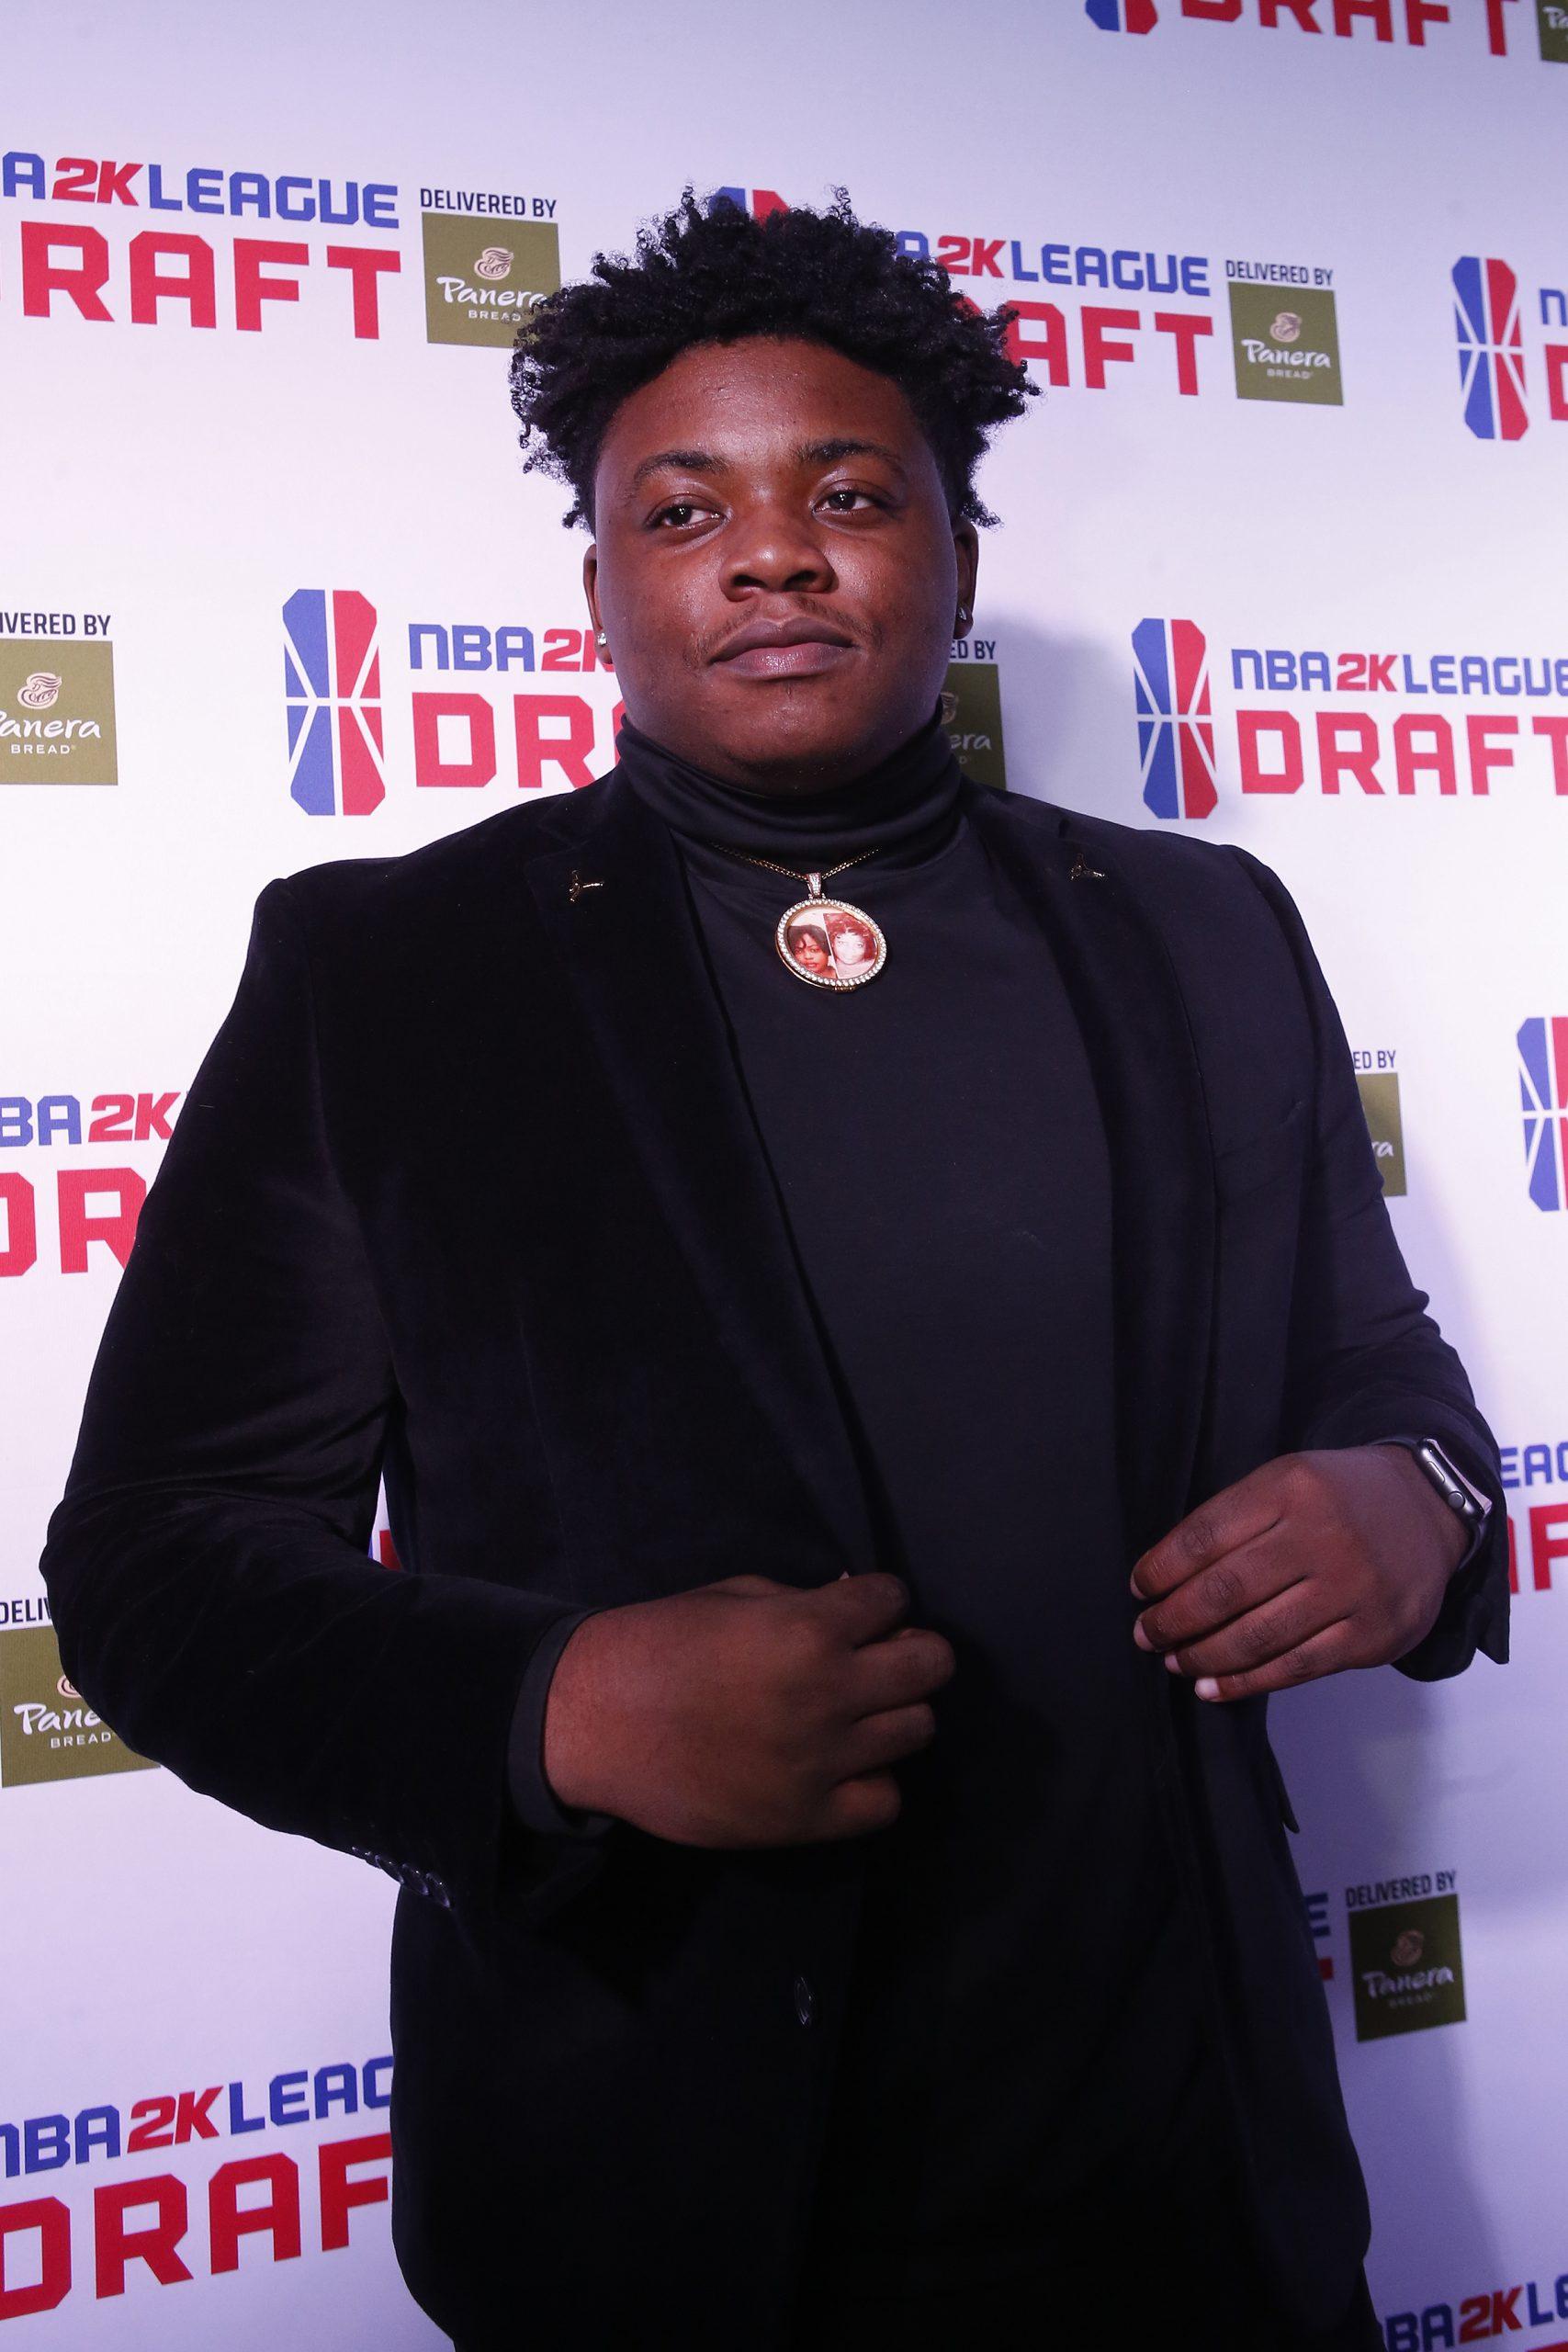 2020 HEAT Check NBA 2K League Draft